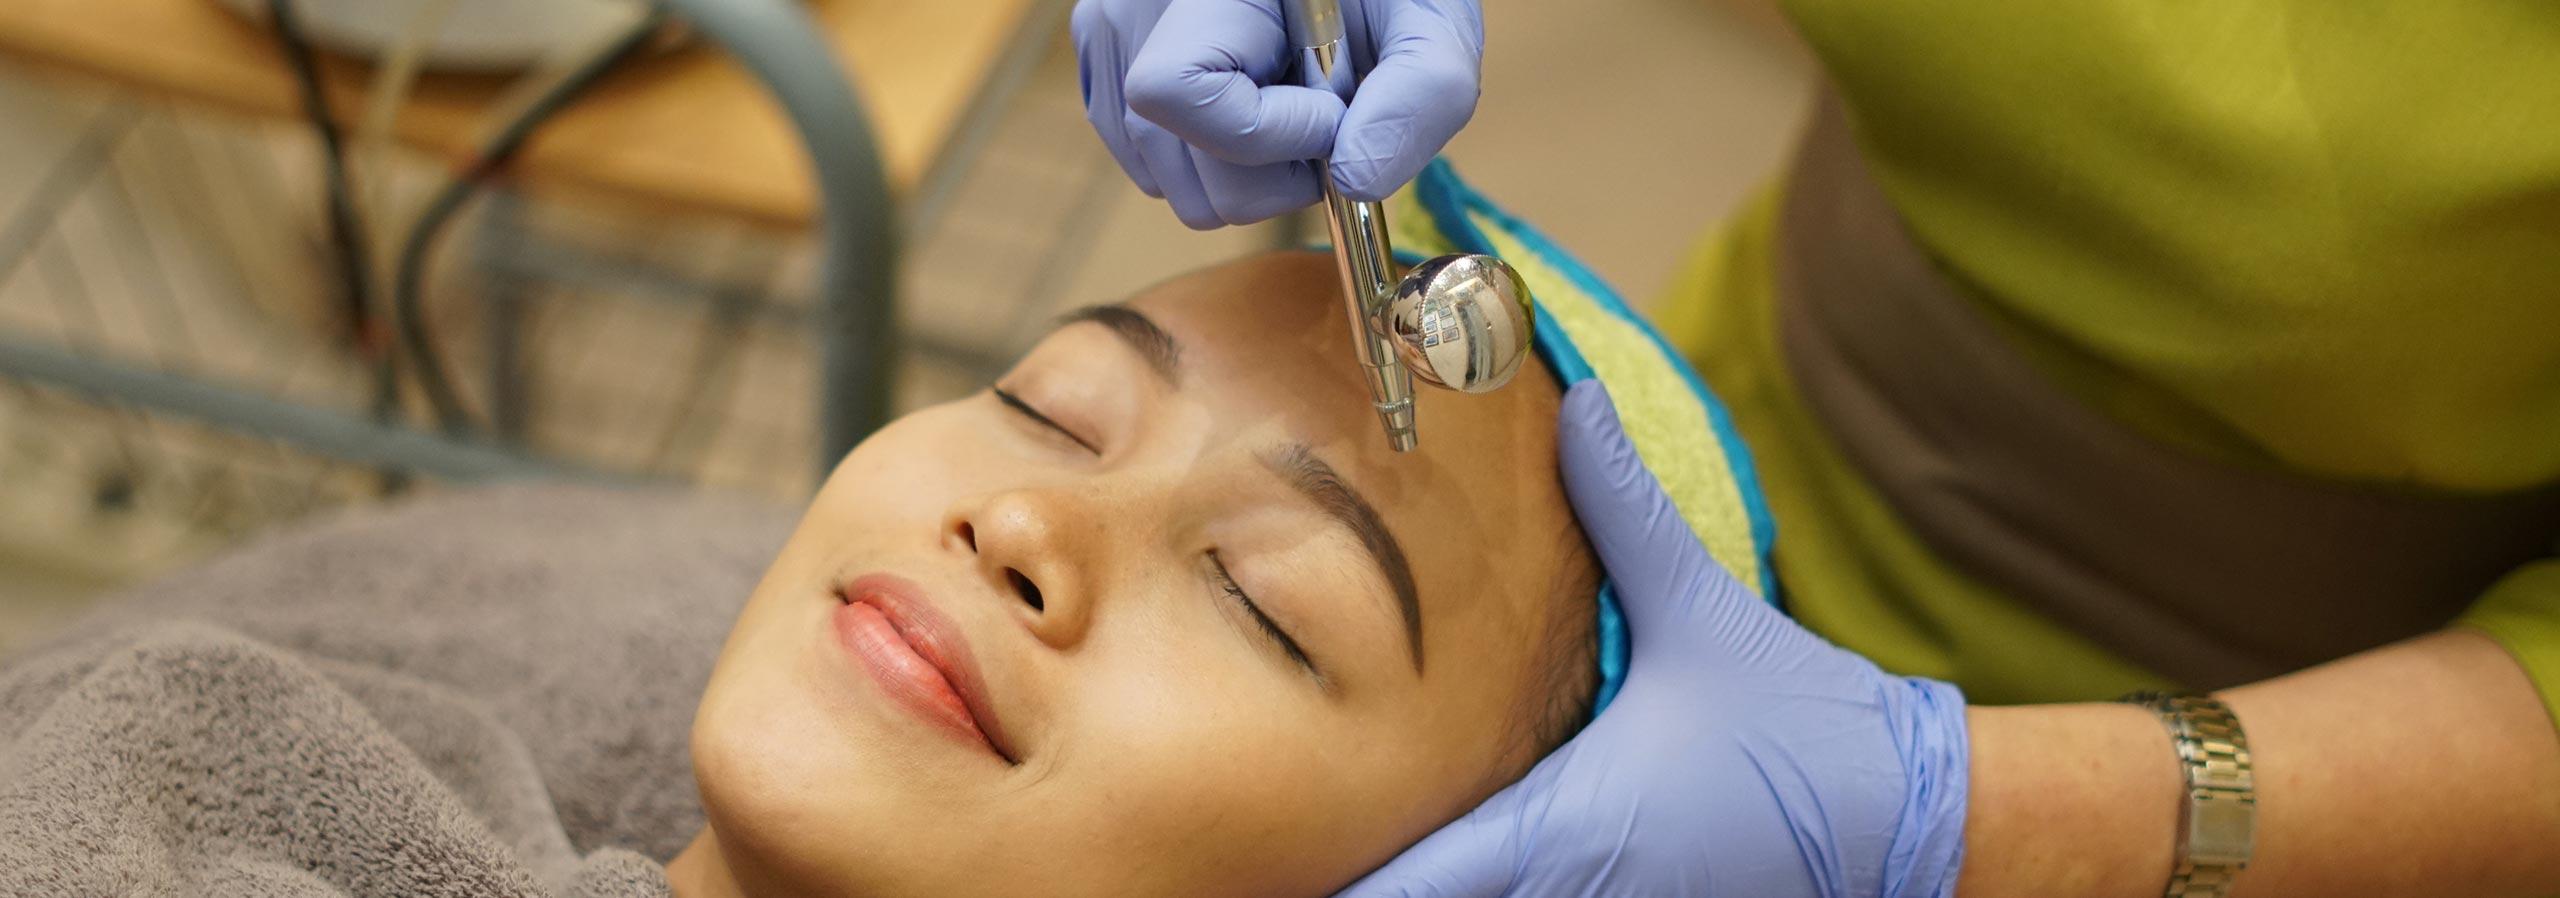 Aqua Therapy Klinik Farmanina